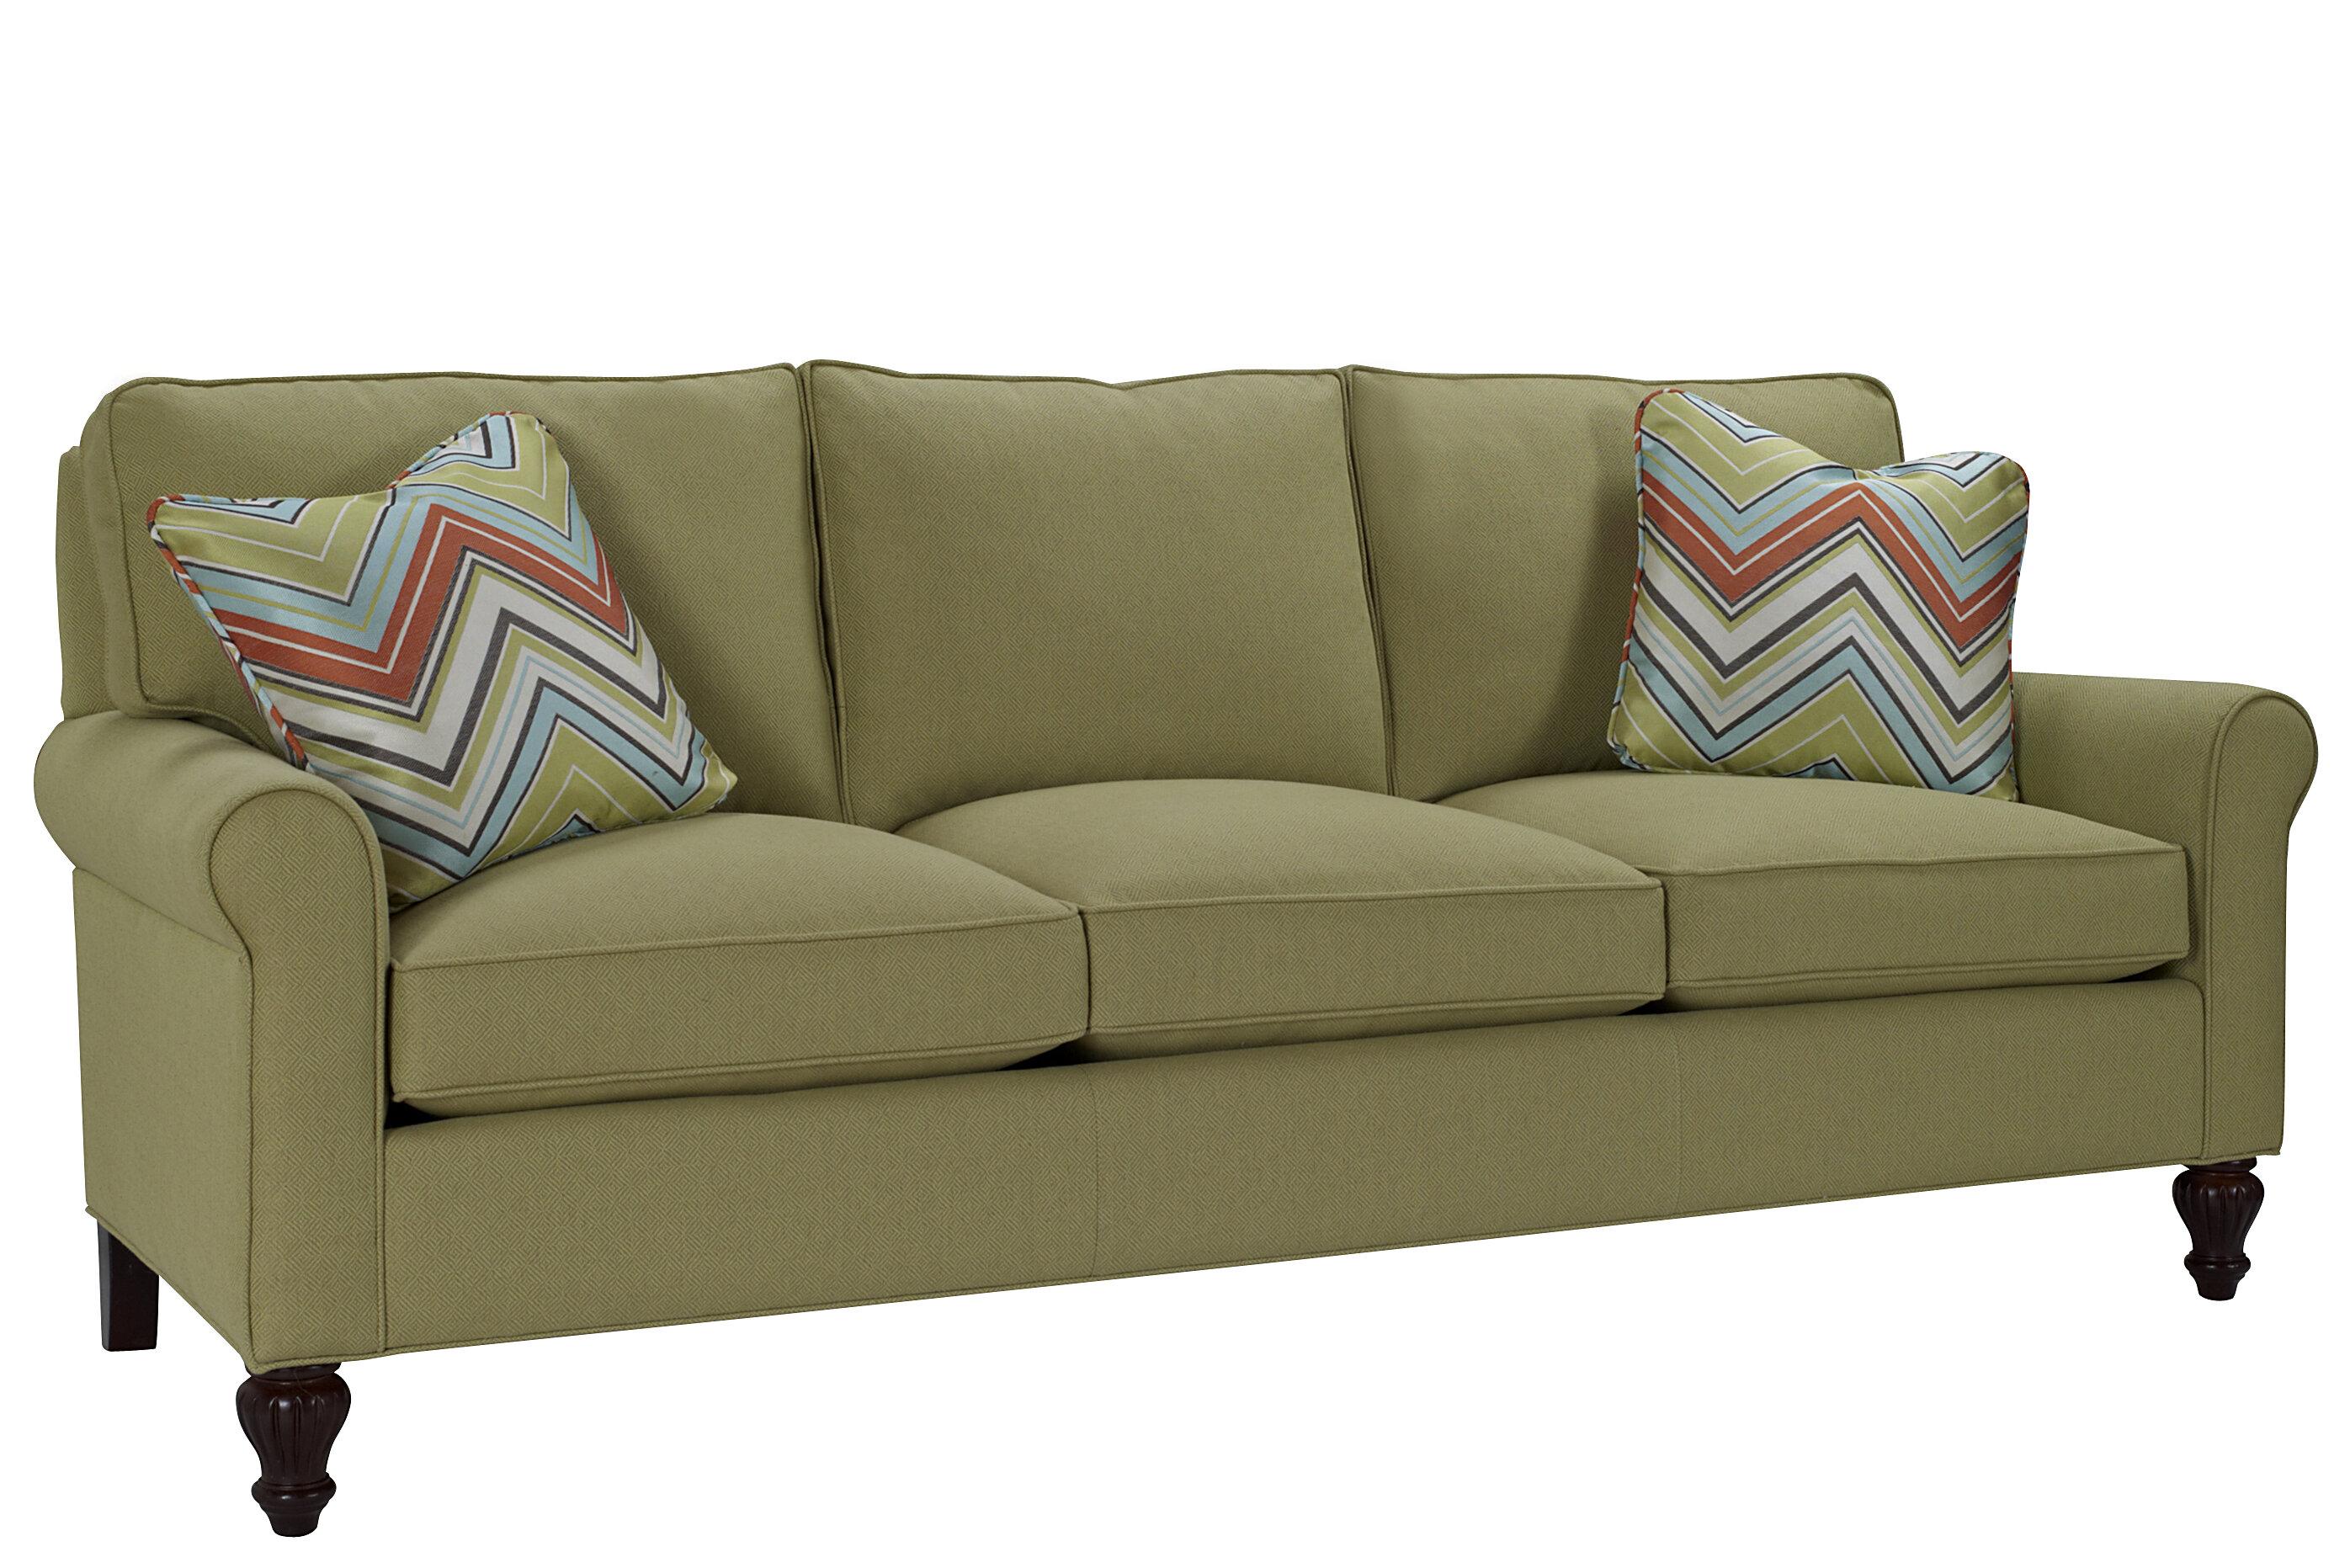 Classic Comfort Curved Arm Three Loose Pillow Back Sofa | Wayfair